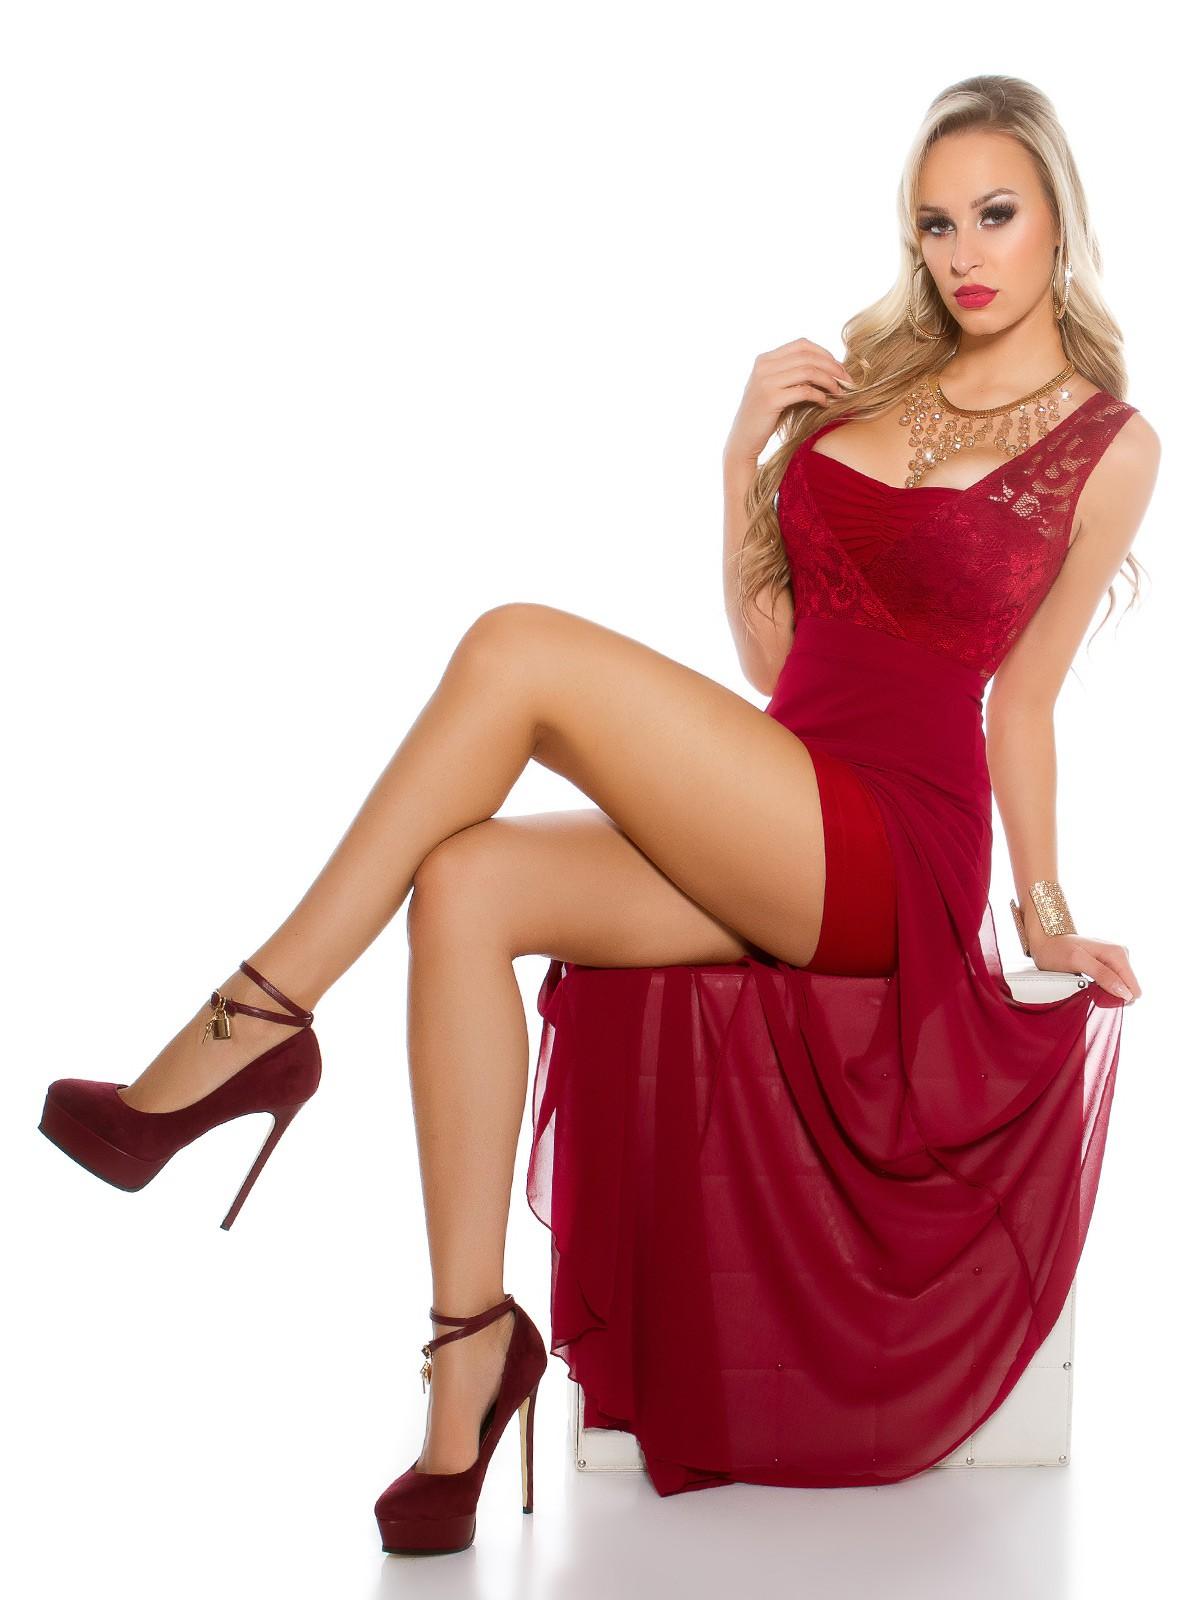 Abendkleid Trendstylez Kleid Kleid Abendkleid Trendstylez Kleid Abendkleid Trendstylez Trendstylez I29WEHDY